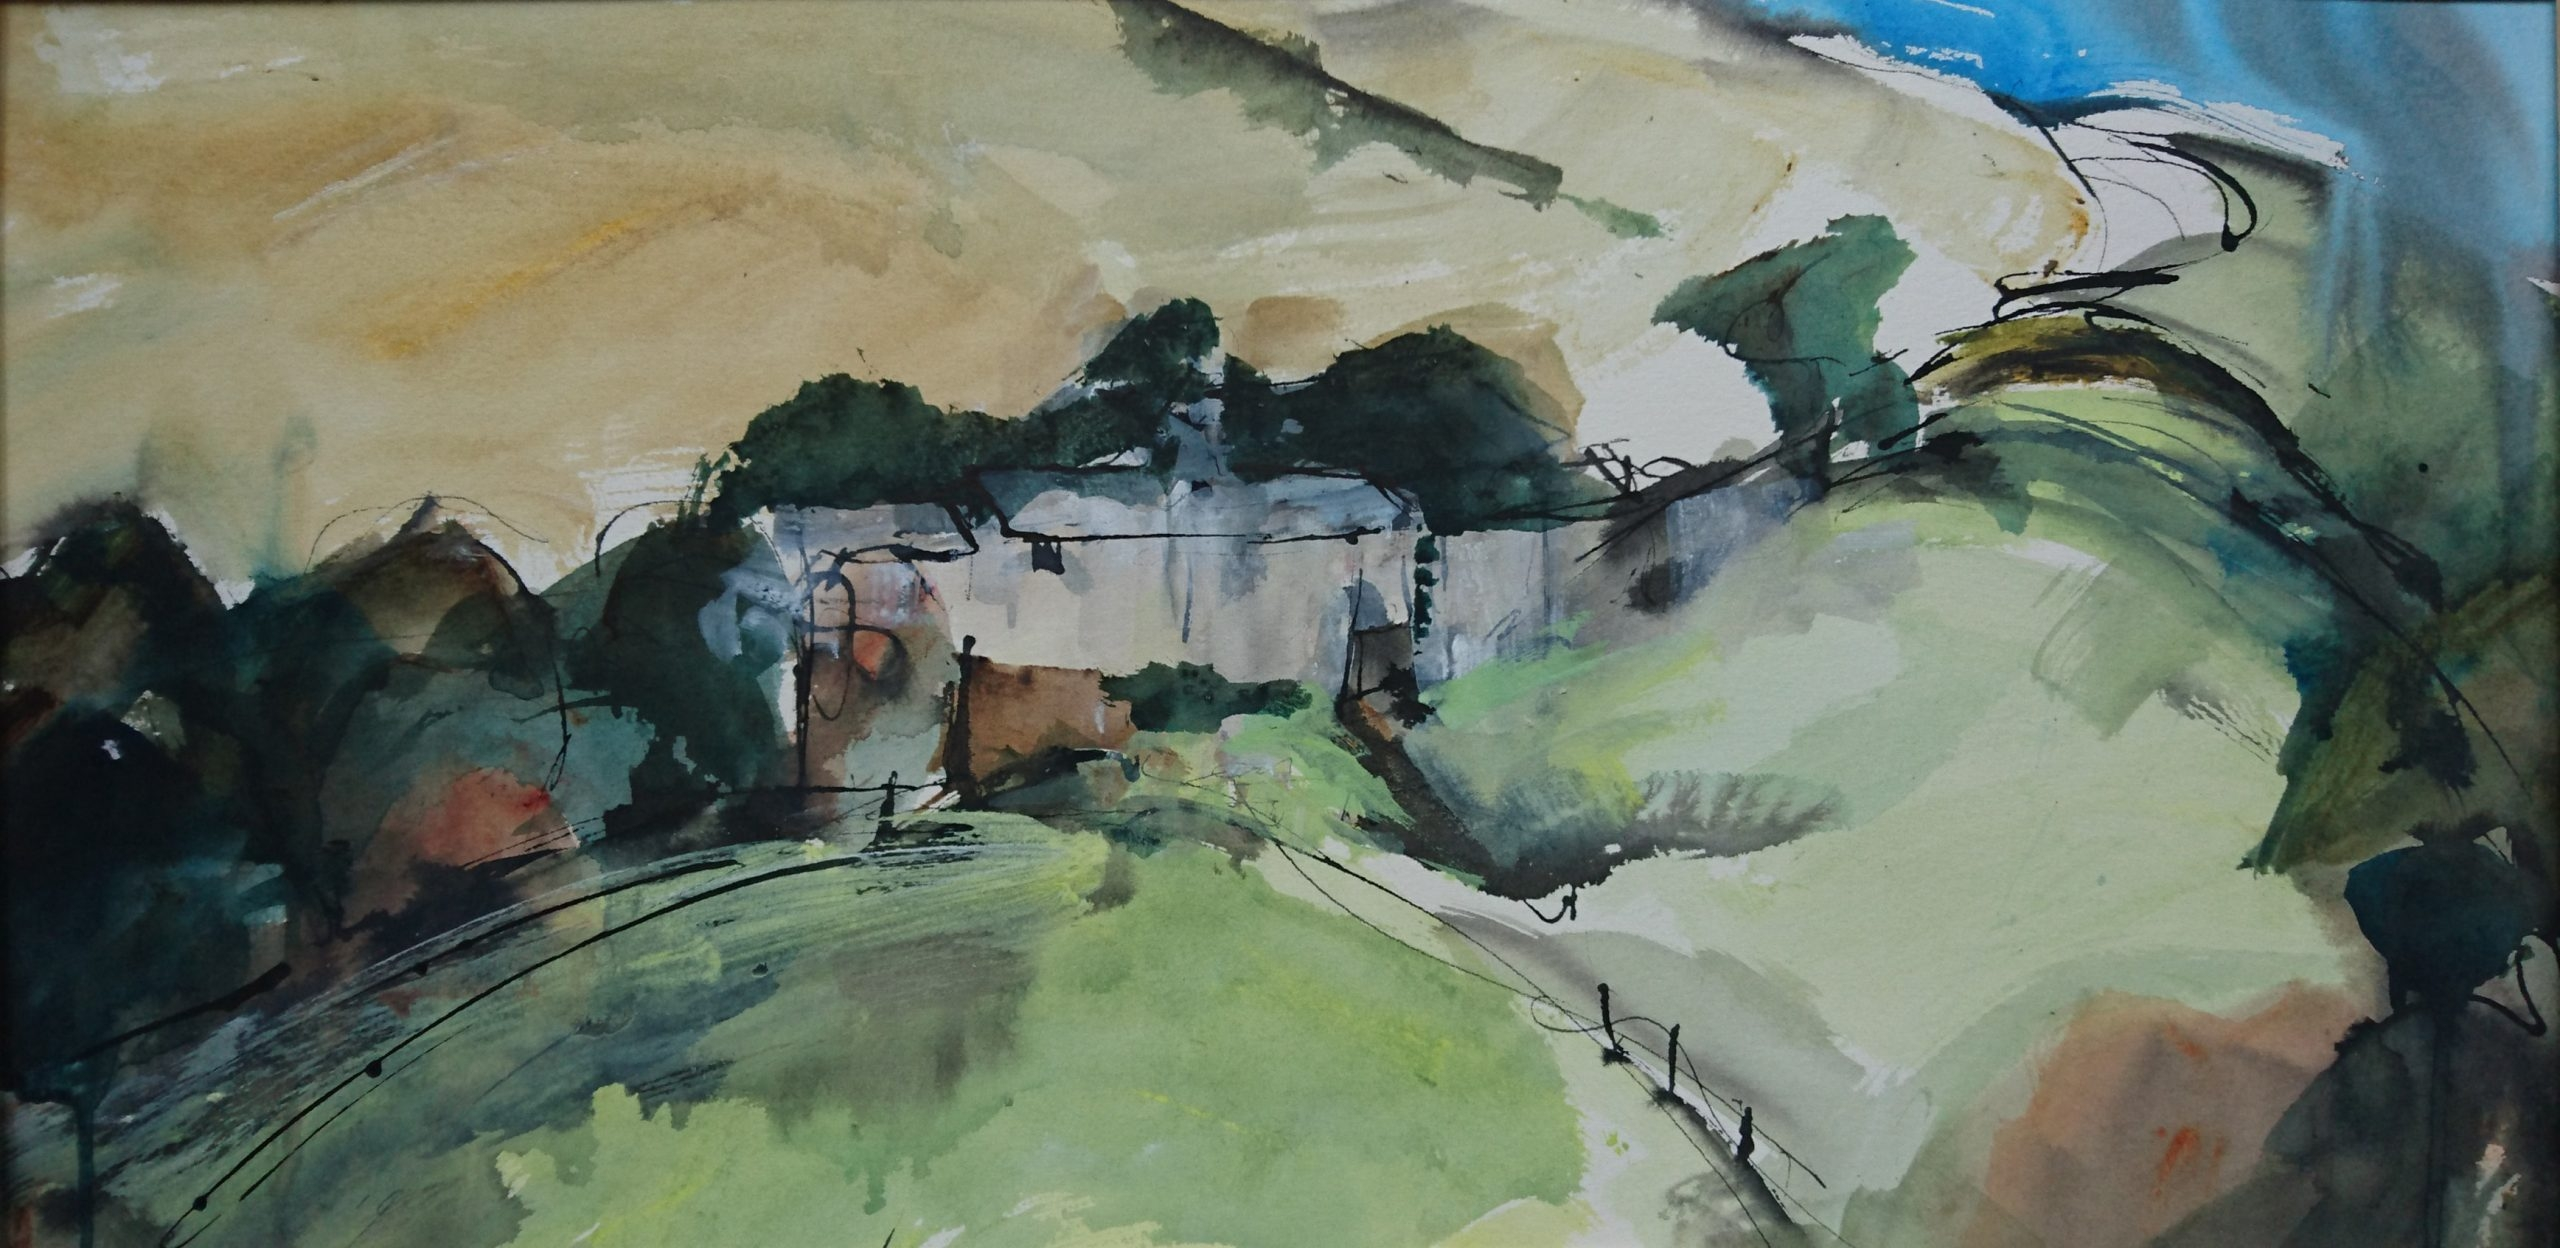 shirley-anne-owen-valley-farm-9-mixed-media-on-watercolour-paper-63w-x-30cm